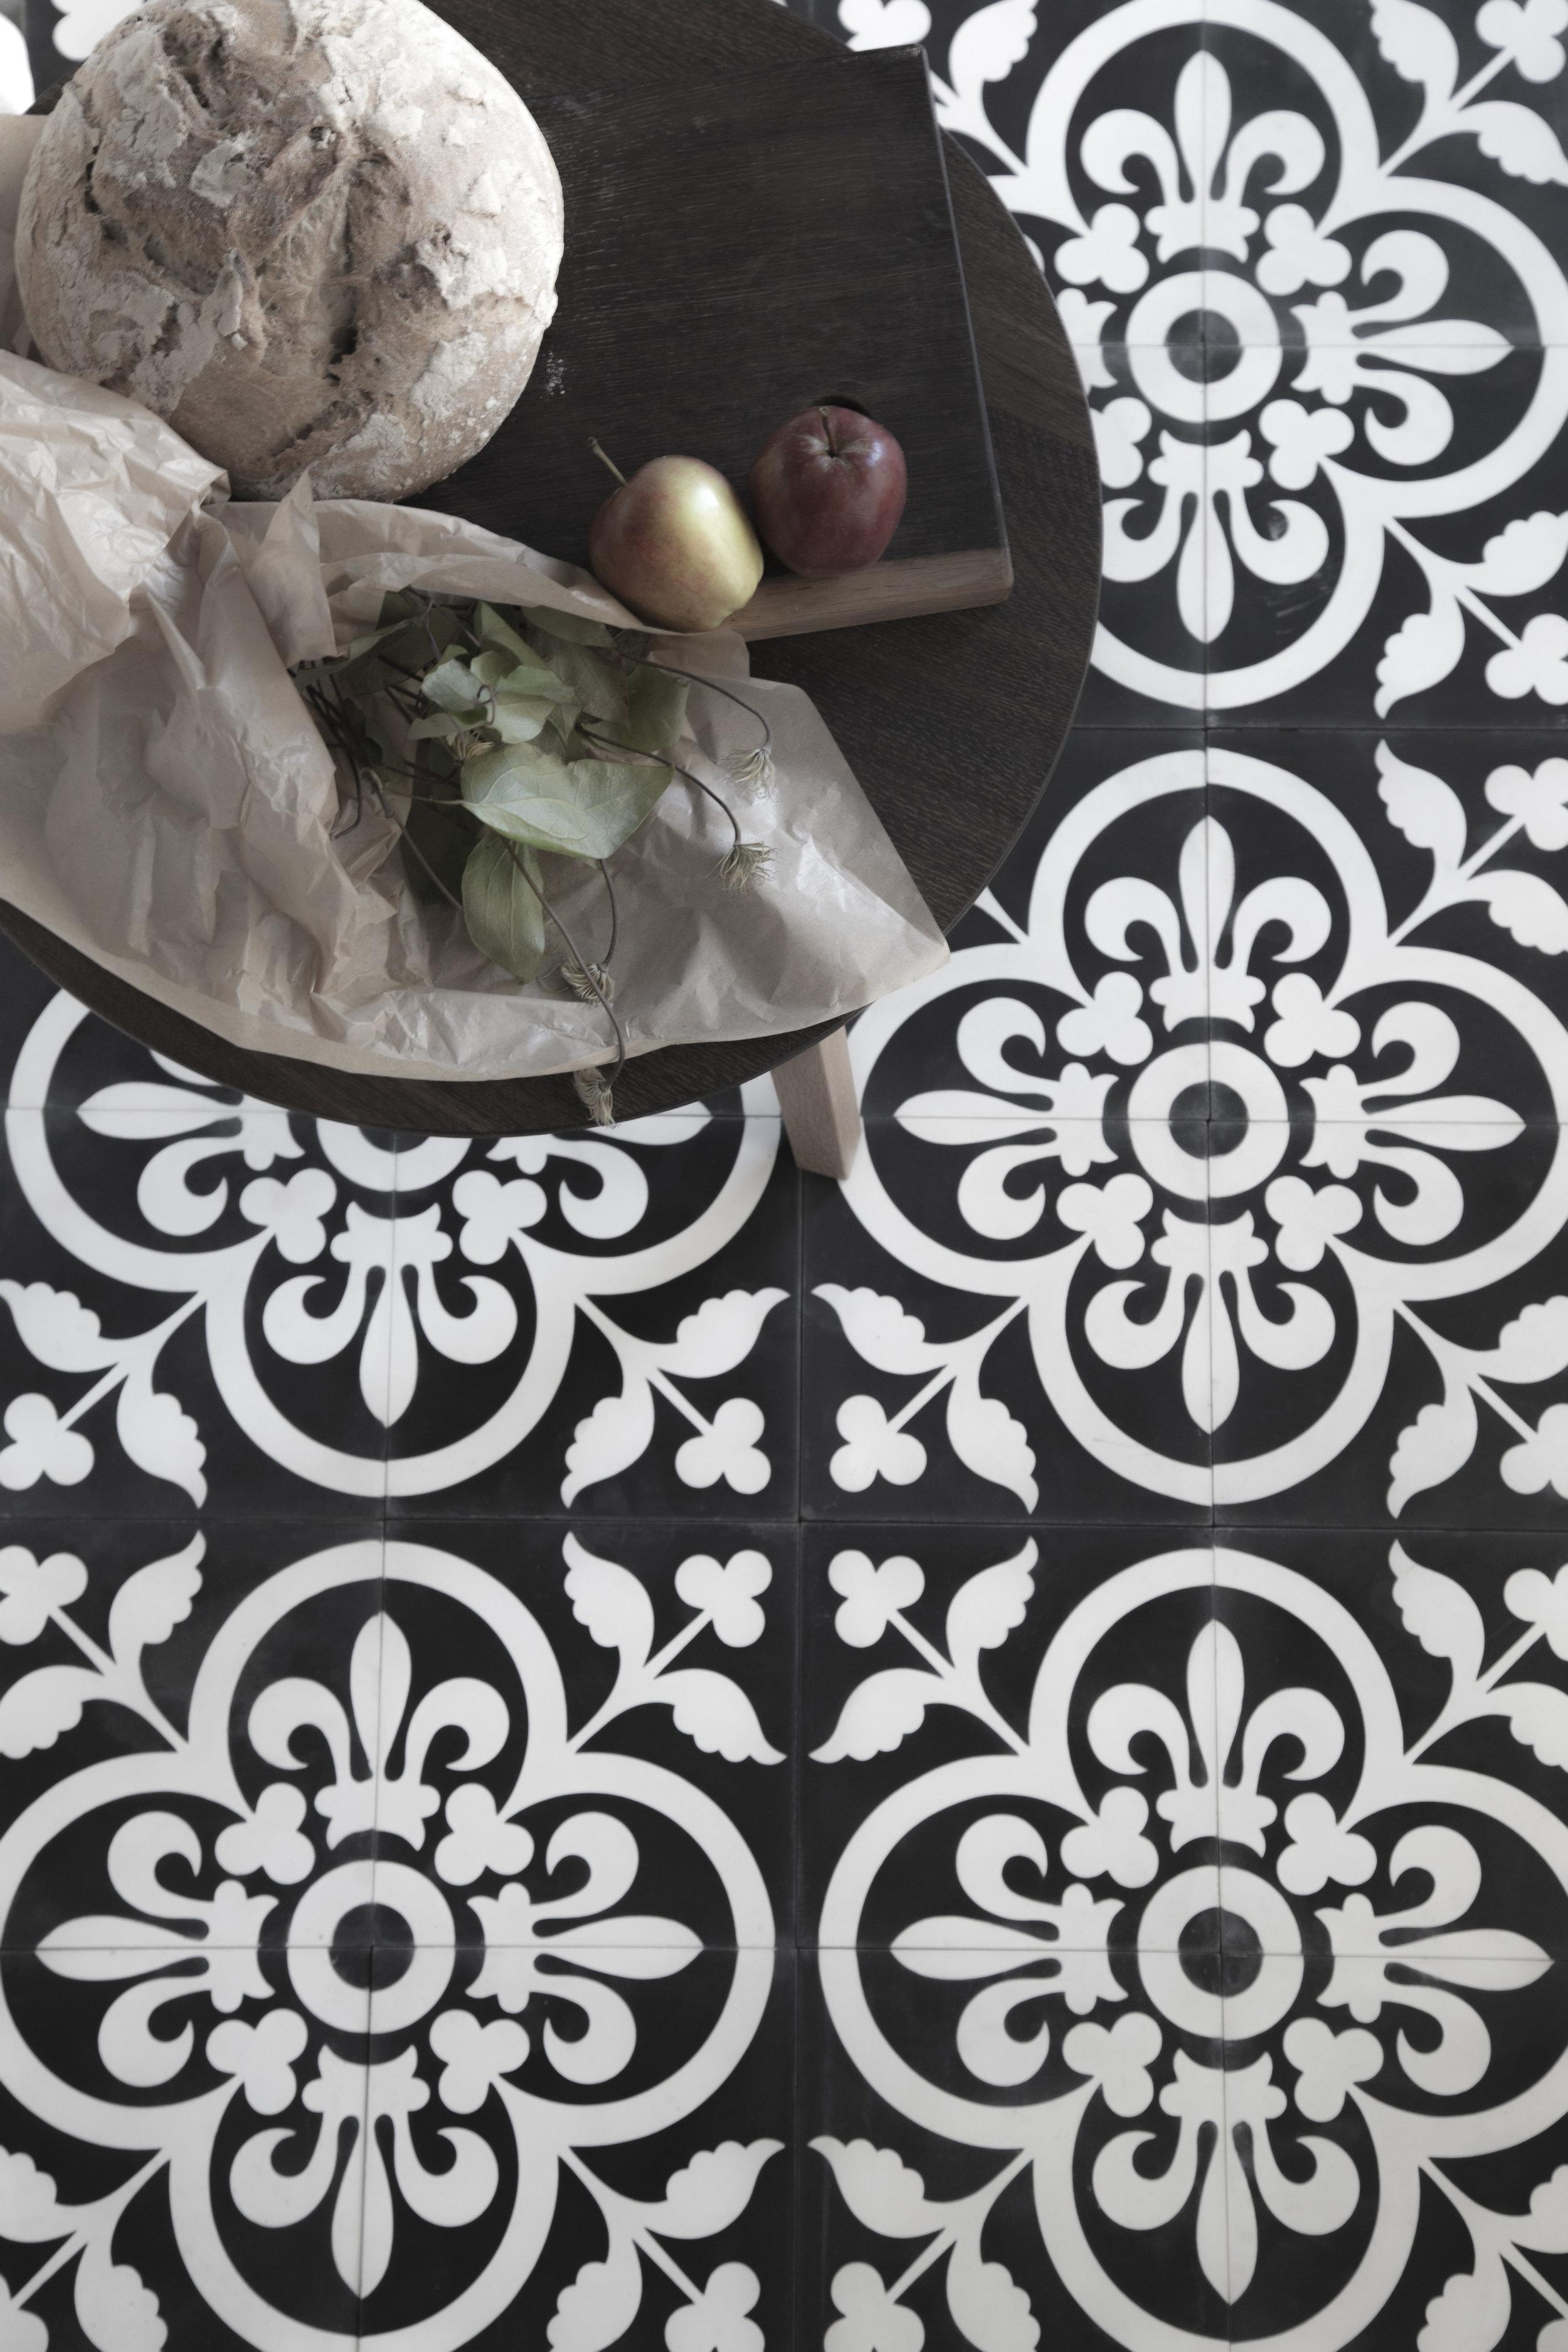 iris svart bord blomst copy.jpg